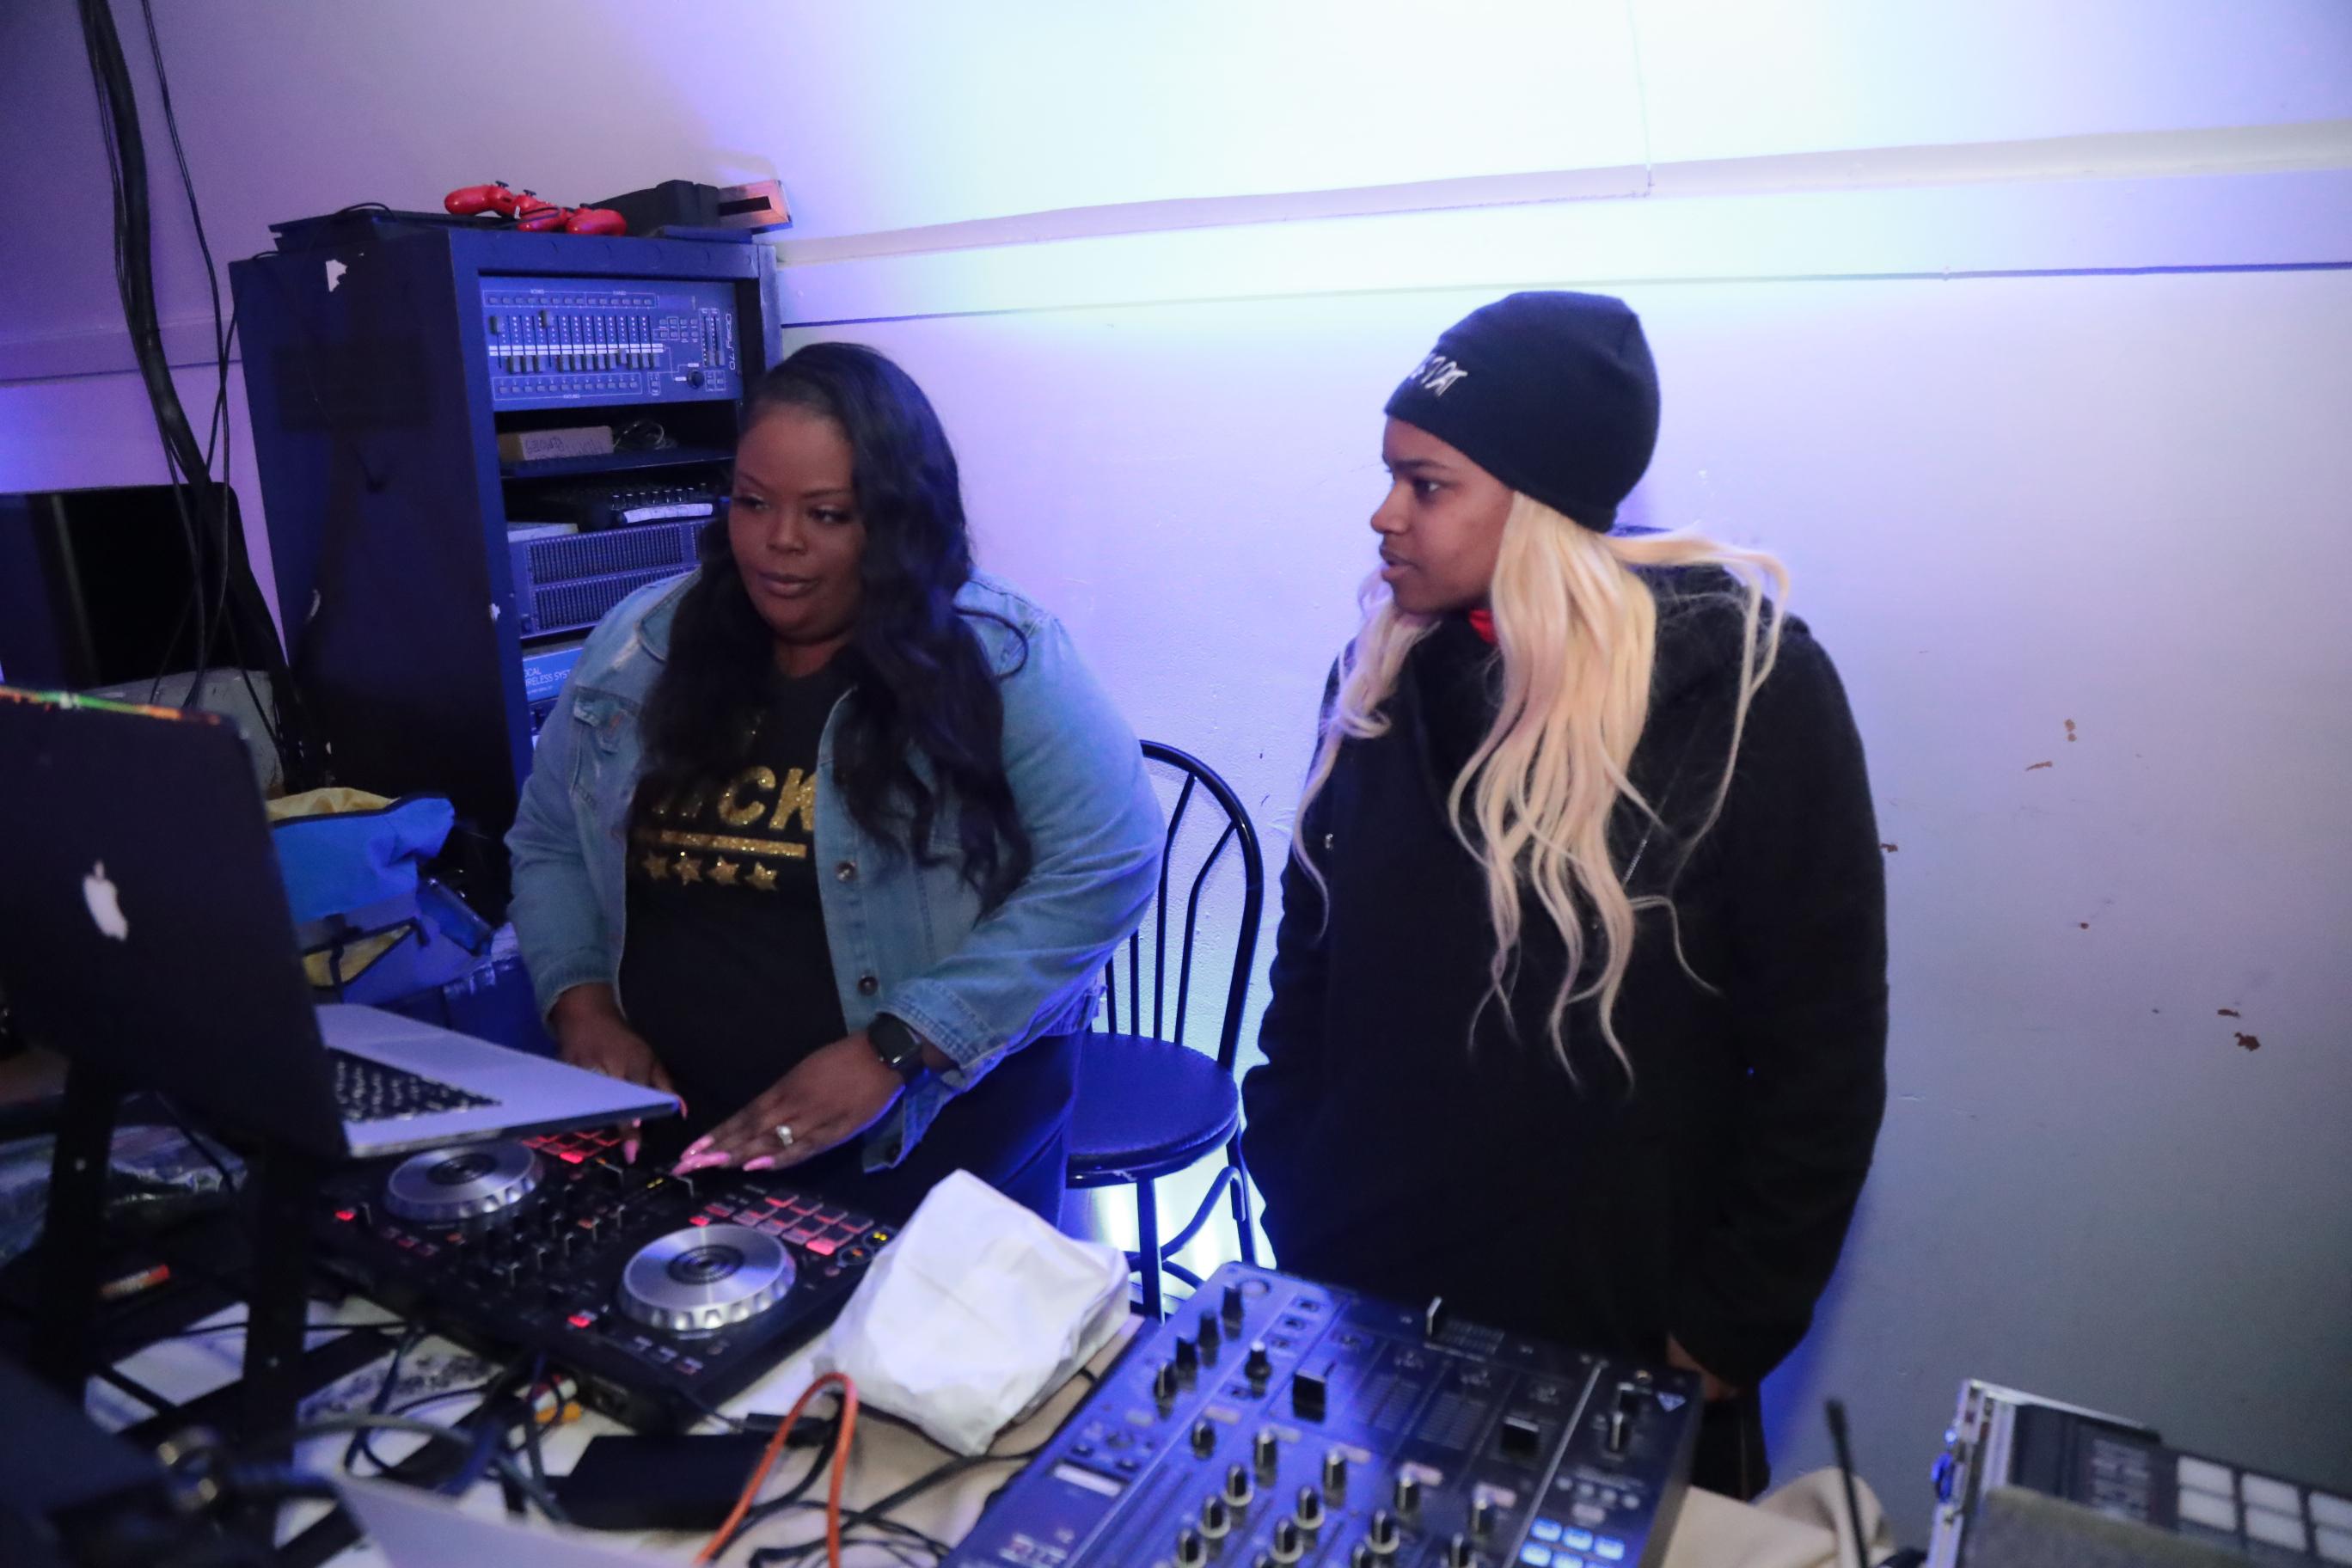 Dj Nicki J with Attendee